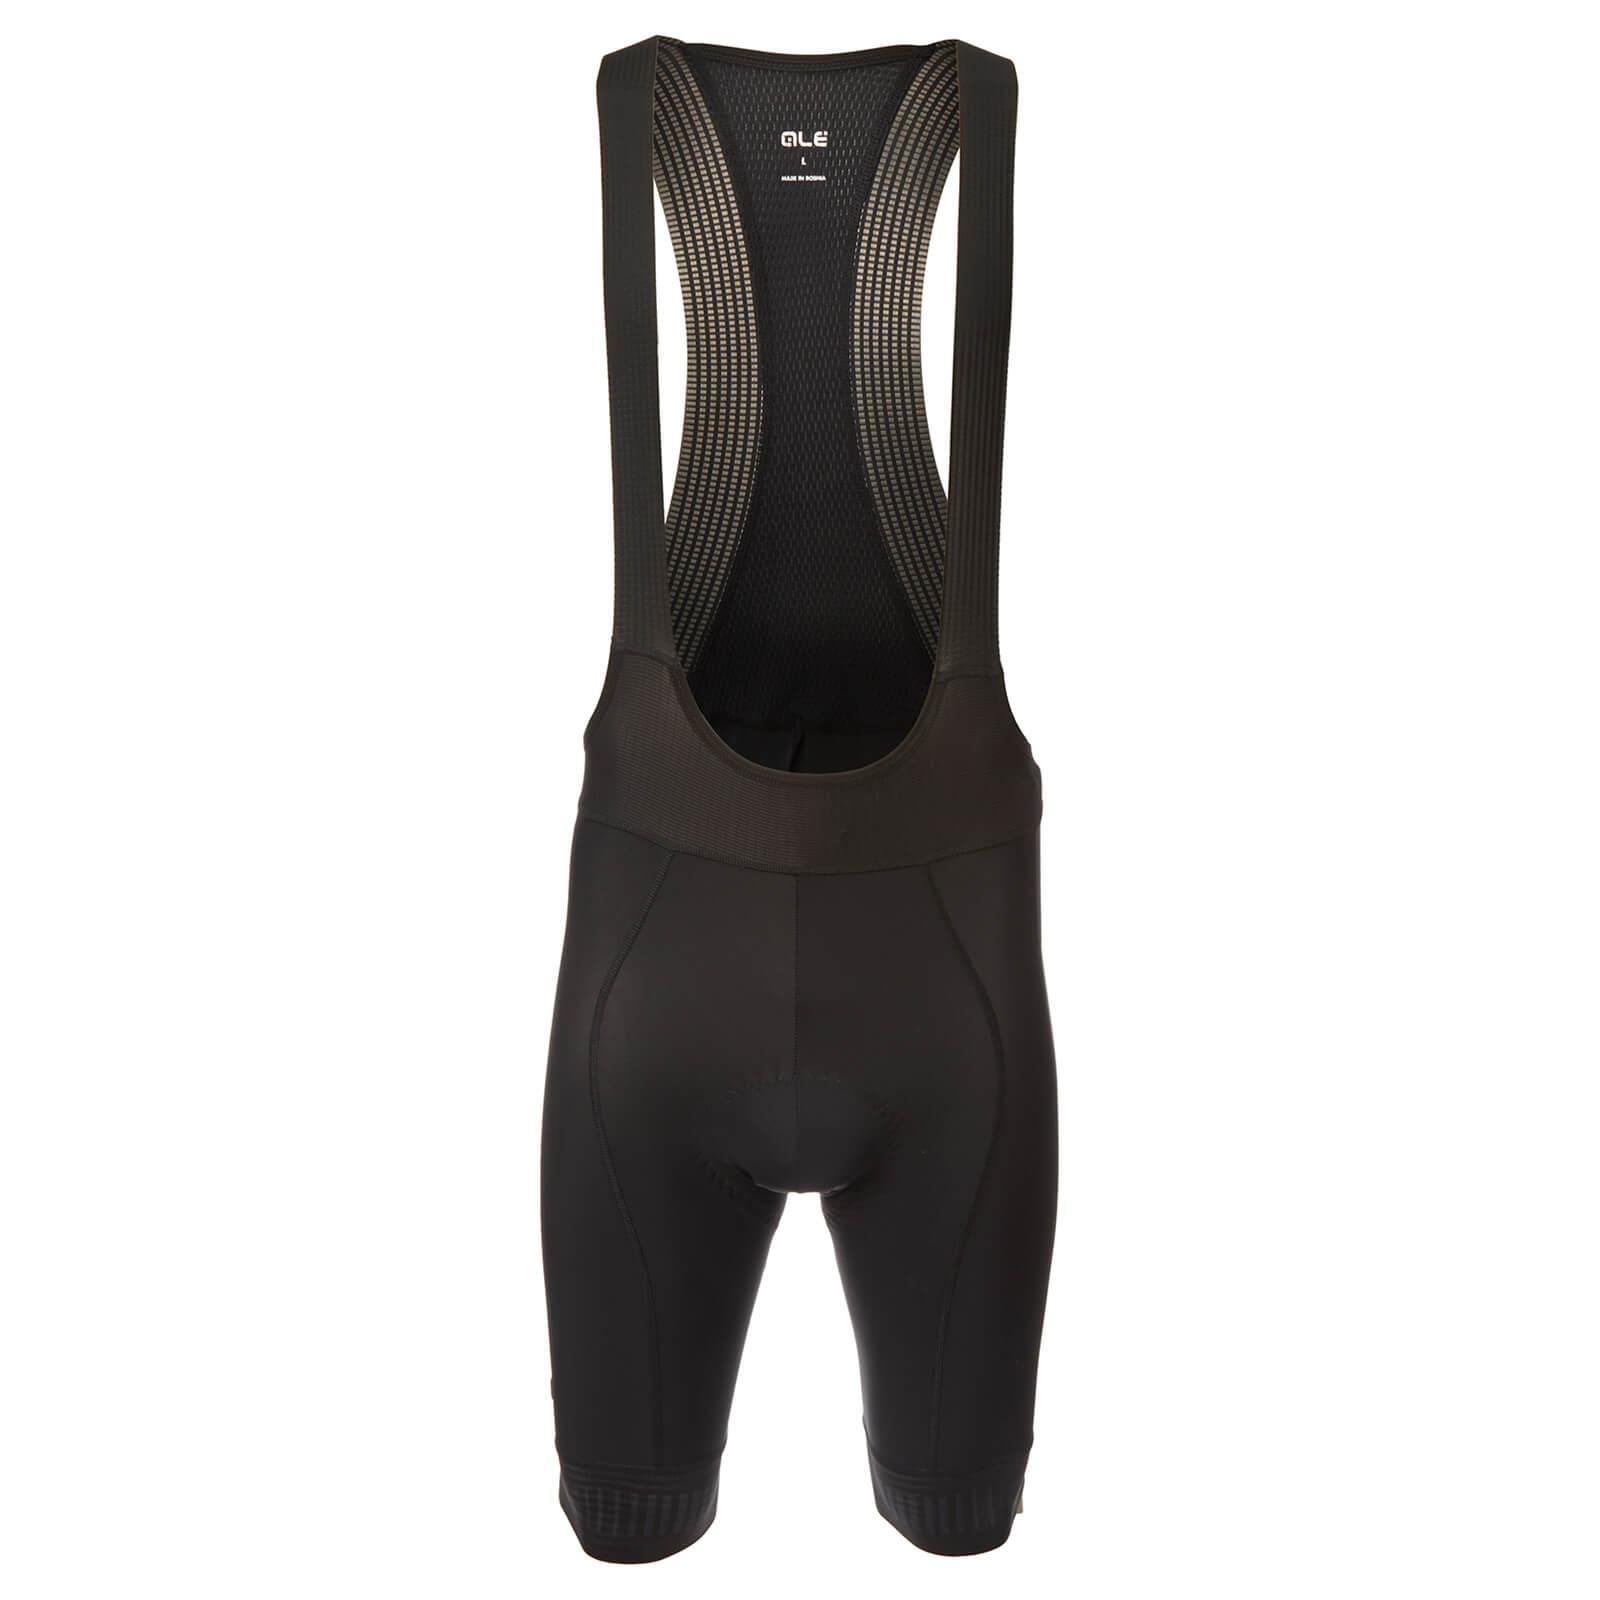 Alé PRR Strada Bib Shorts - XXL - Black/Charcoal